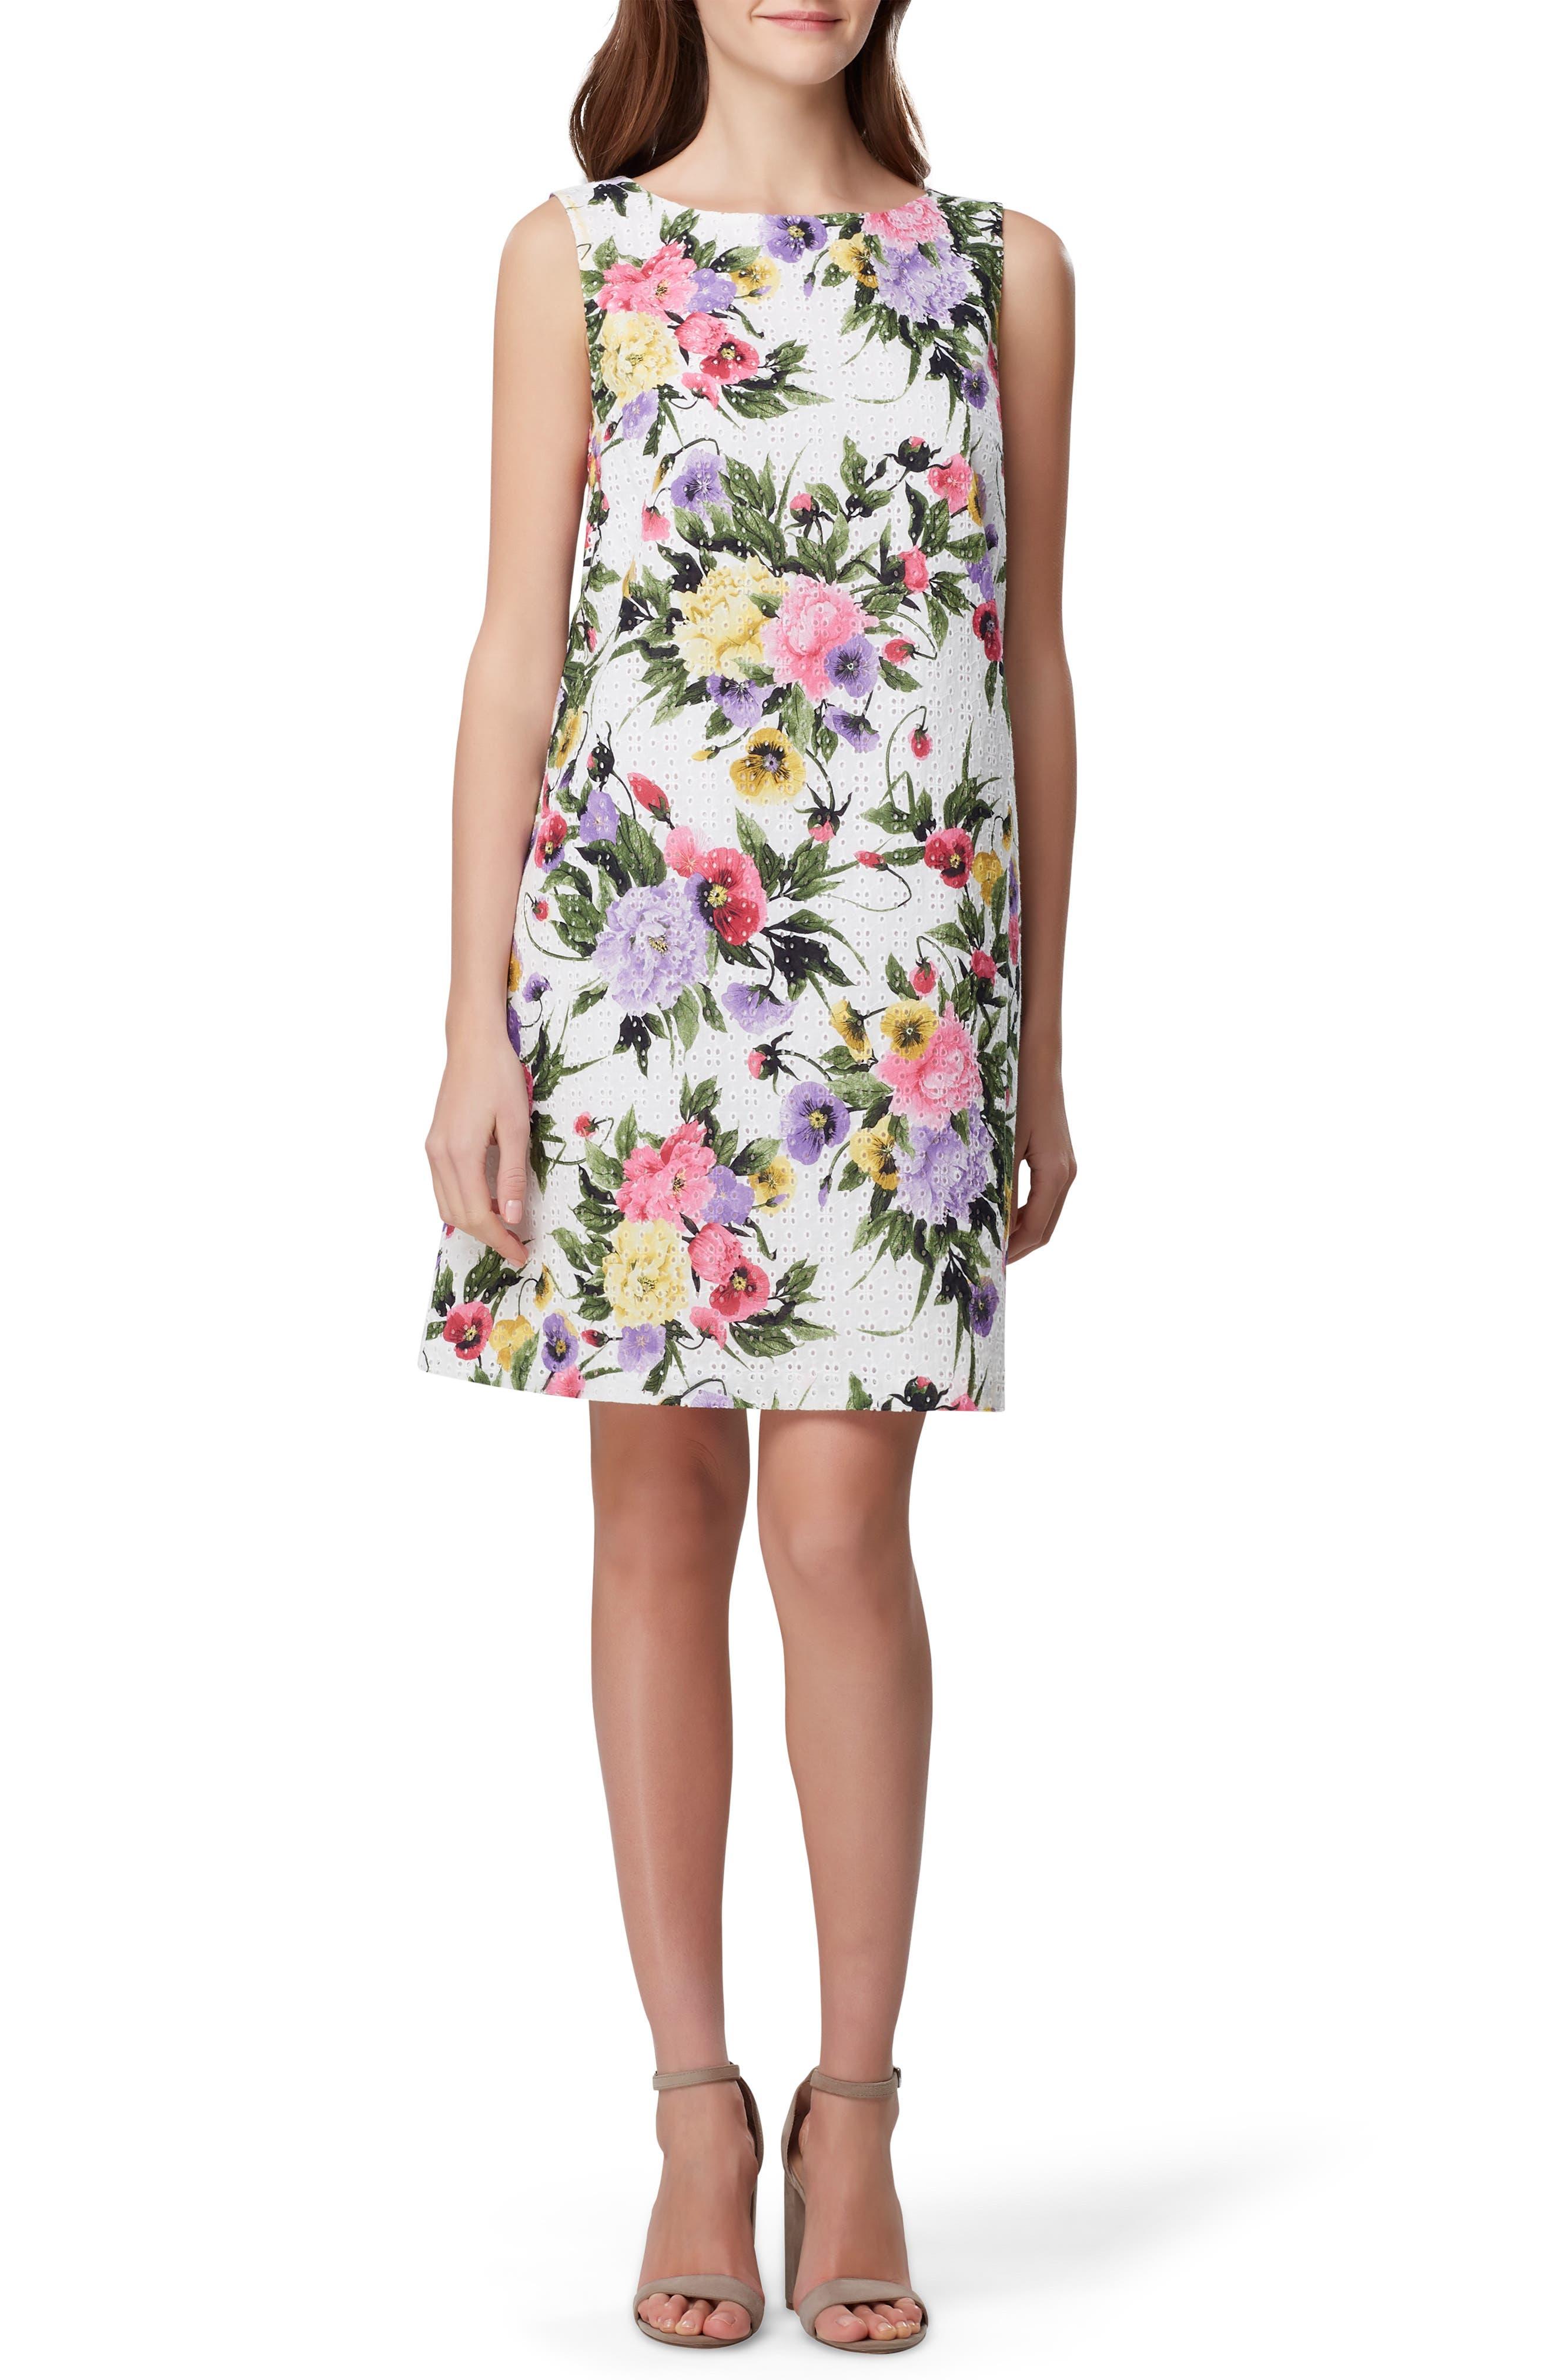 Tahari Floral Eyelet Shift Dress, White